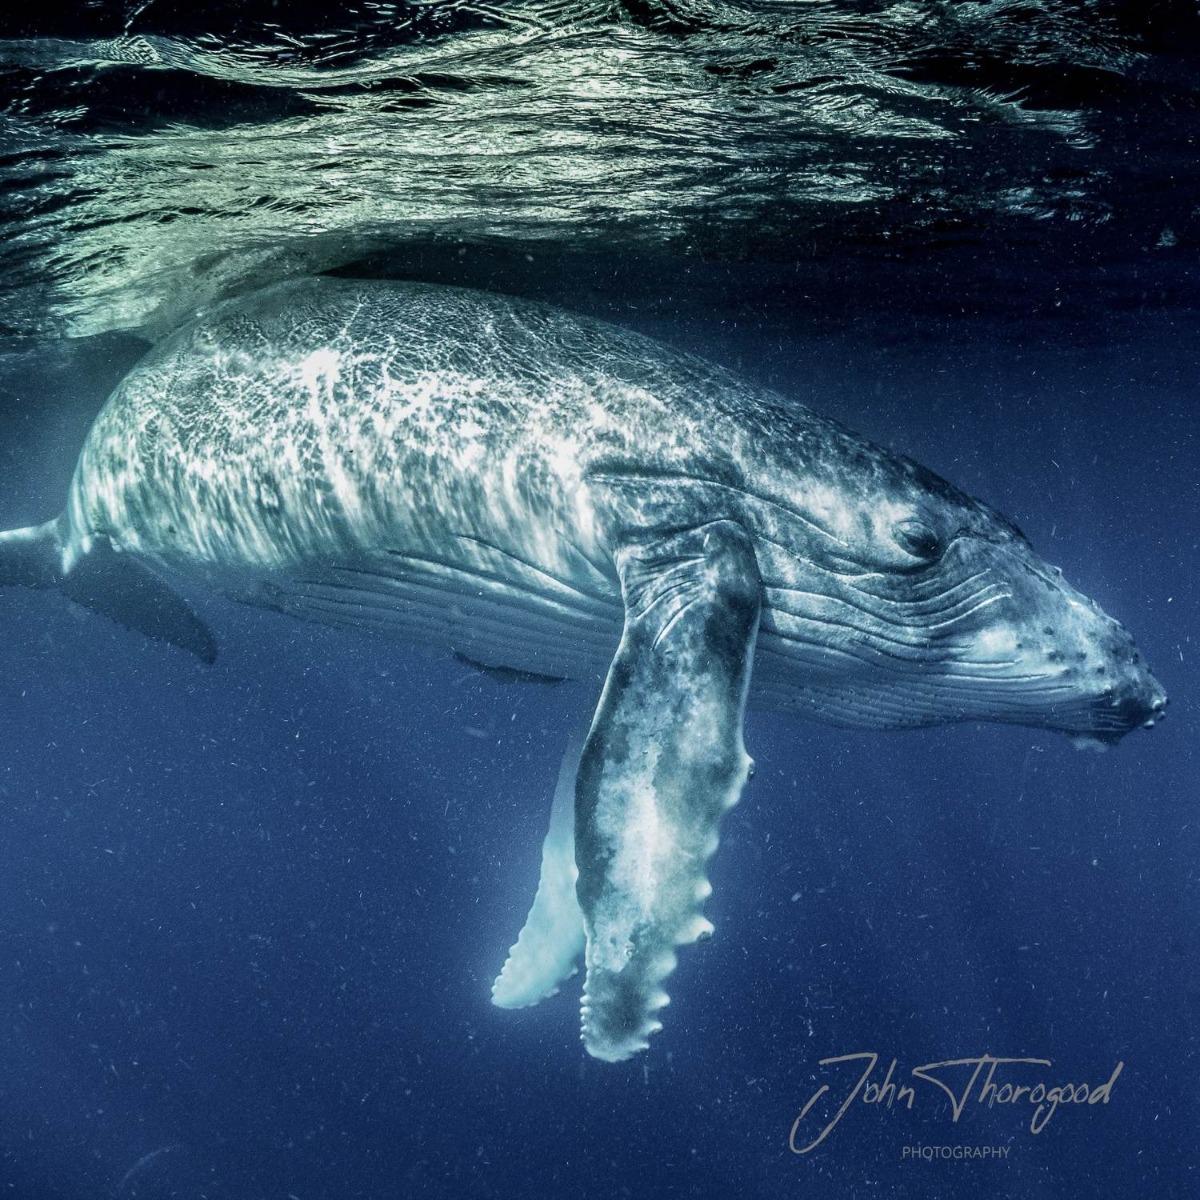 Swimming with Humpback Whales in Tonga. John Thorogood